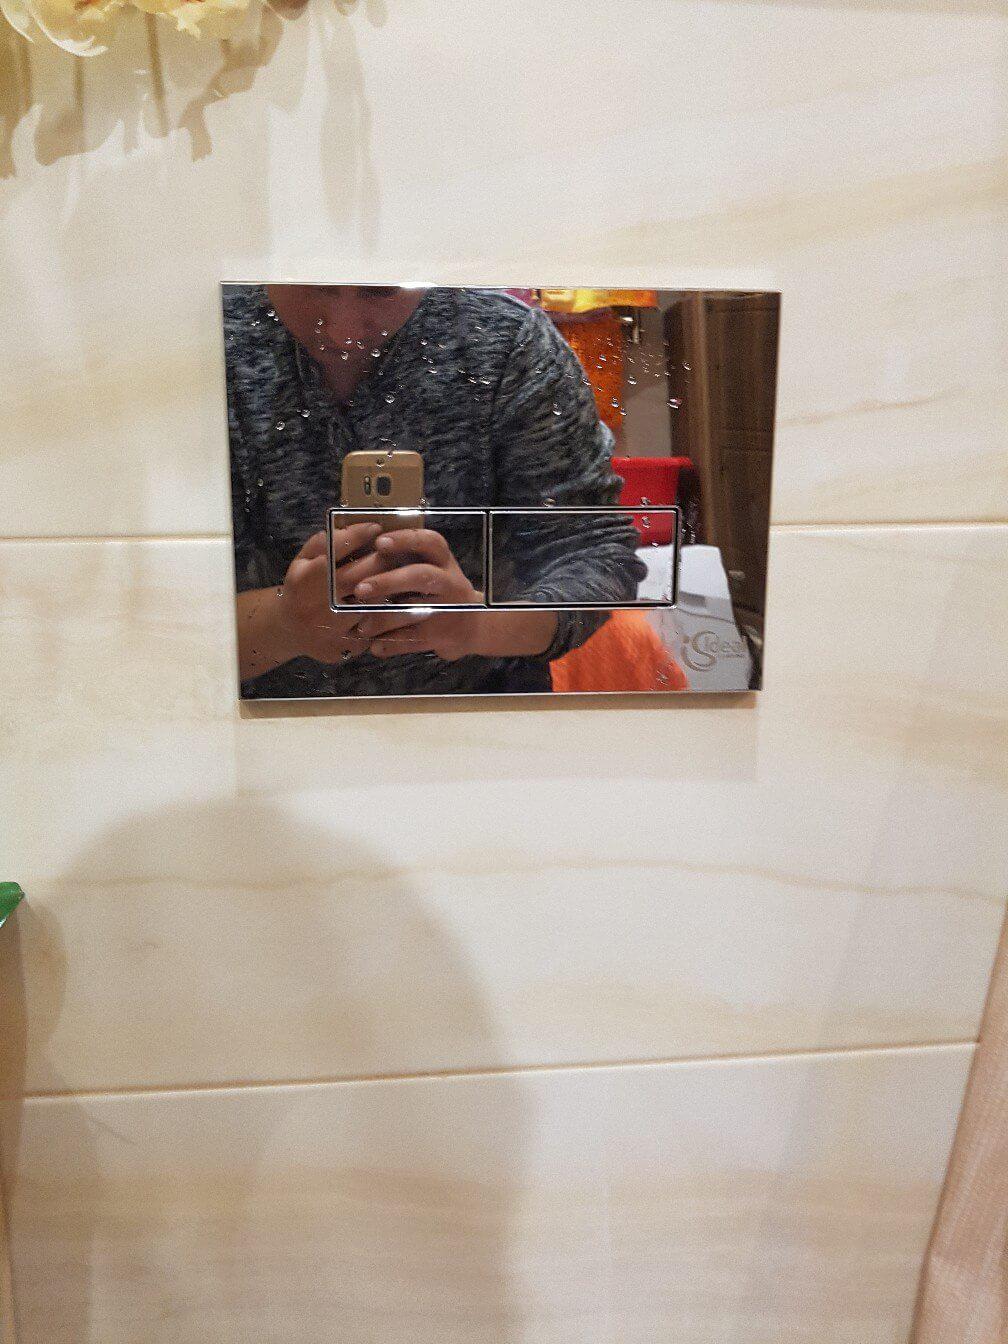 20180104-remont-installacii-ideal-standard-1.jpg